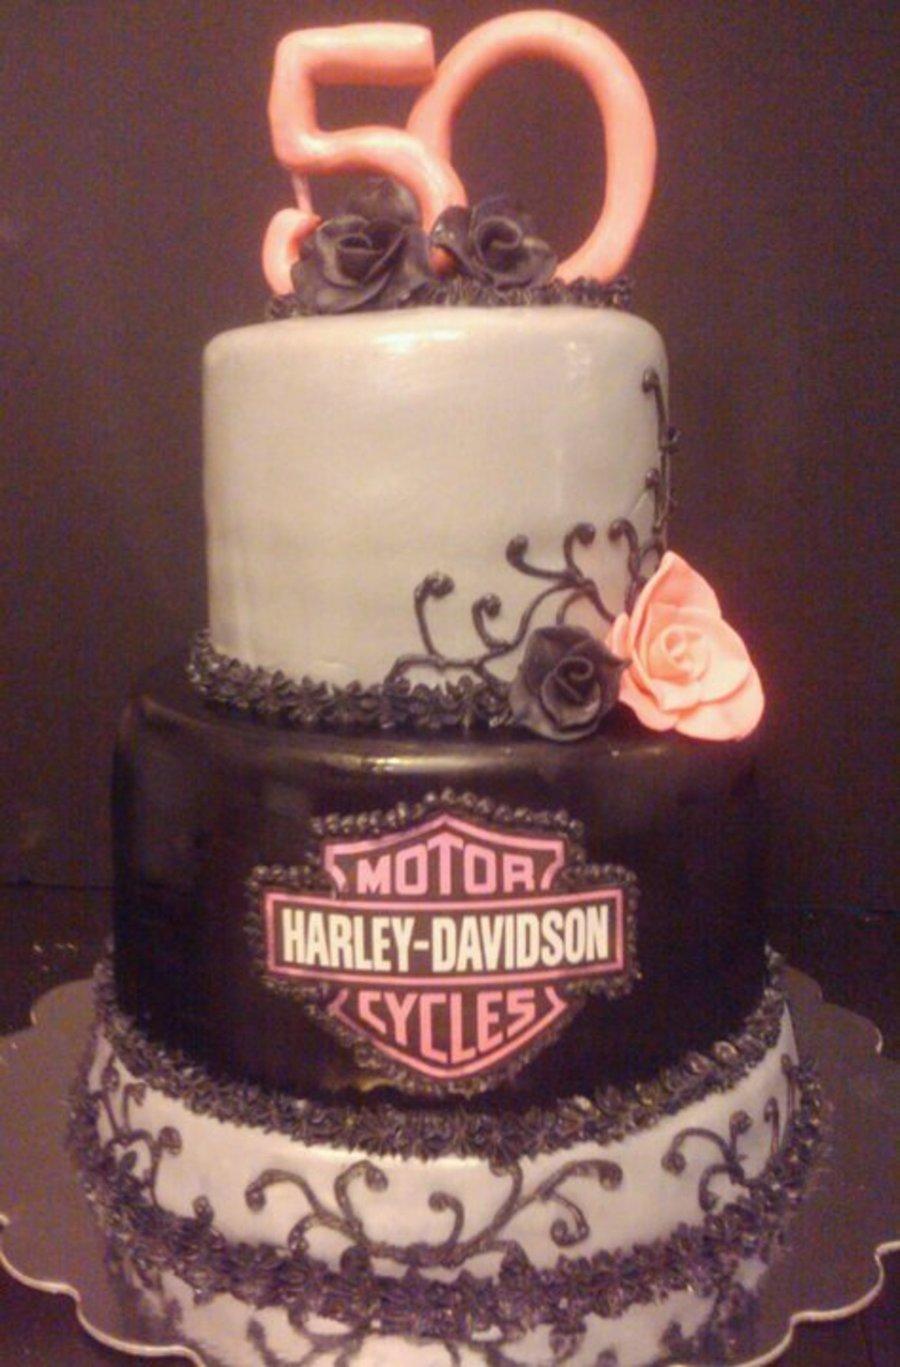 Harley Davidson Womens 50Th Birthday Cake On Central